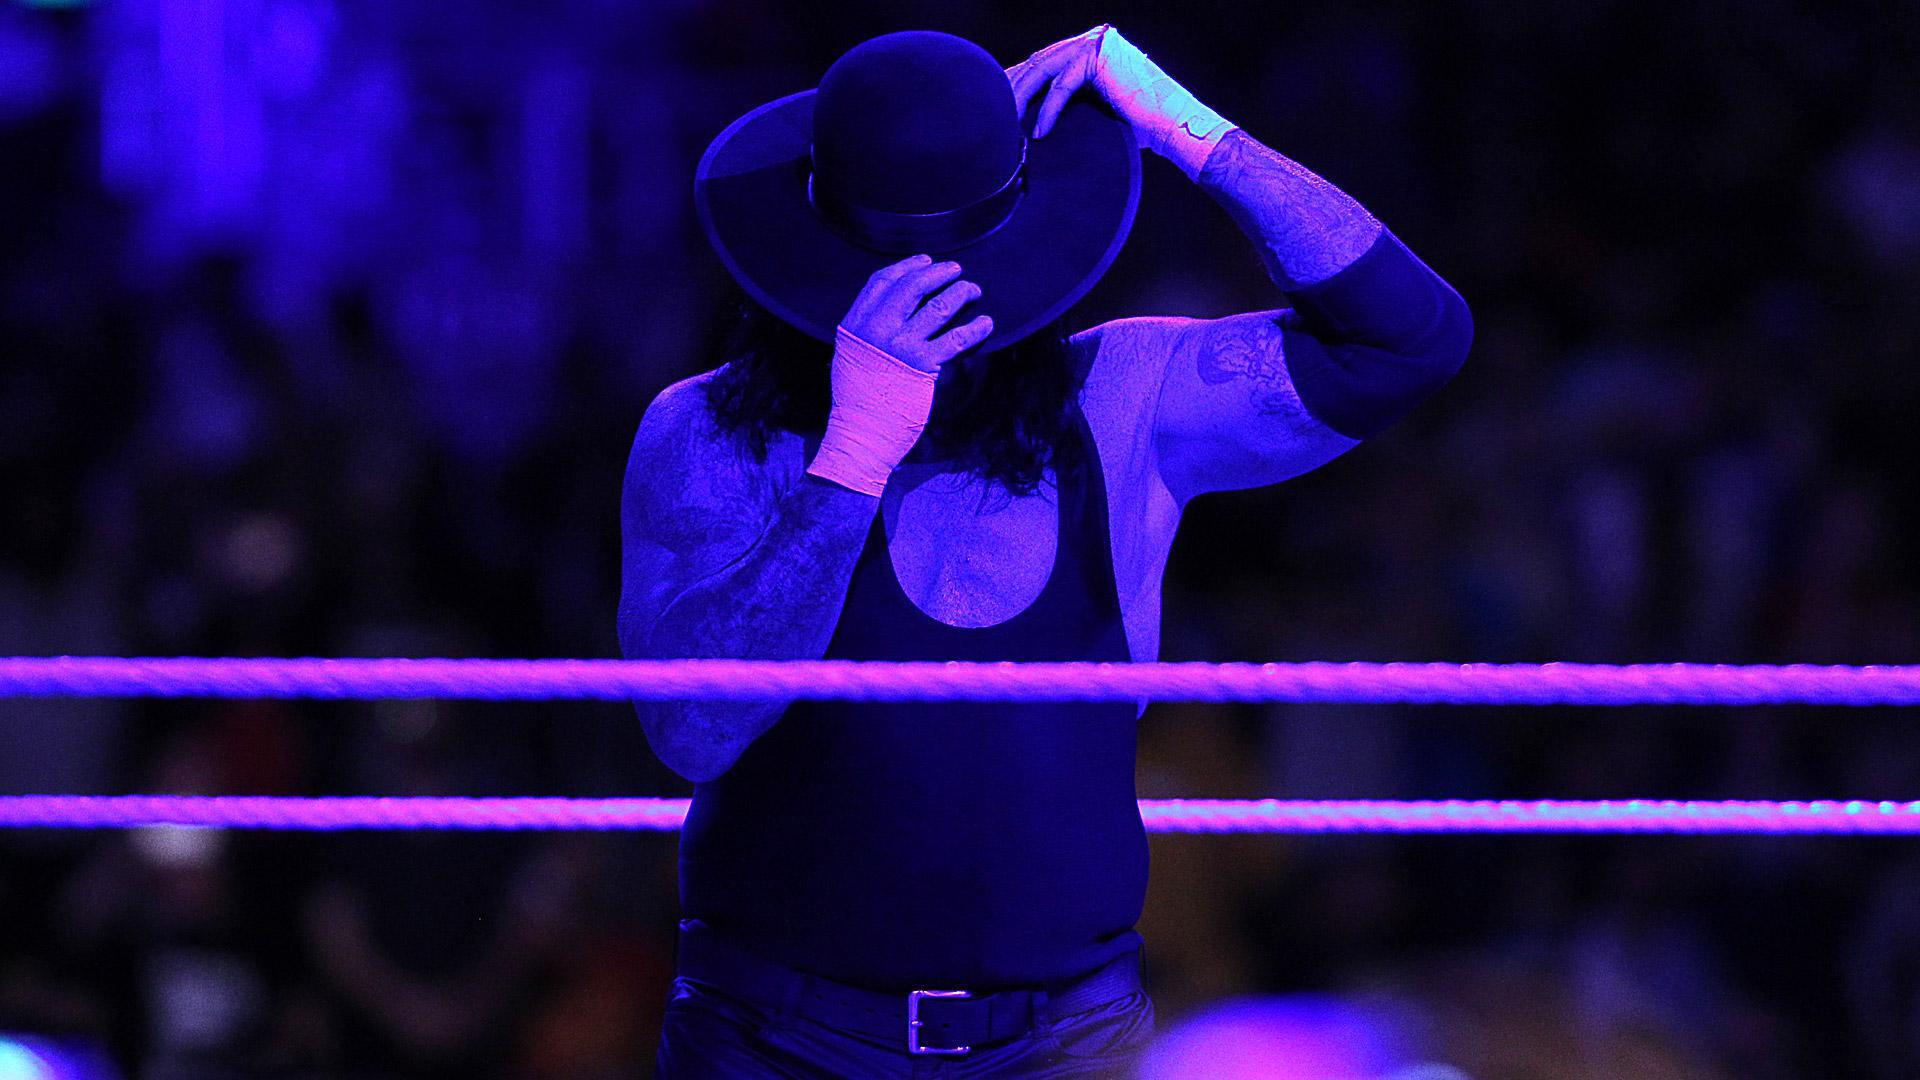 Bild zu Undertaker, WrestleMania, Roman Reigns, WWE